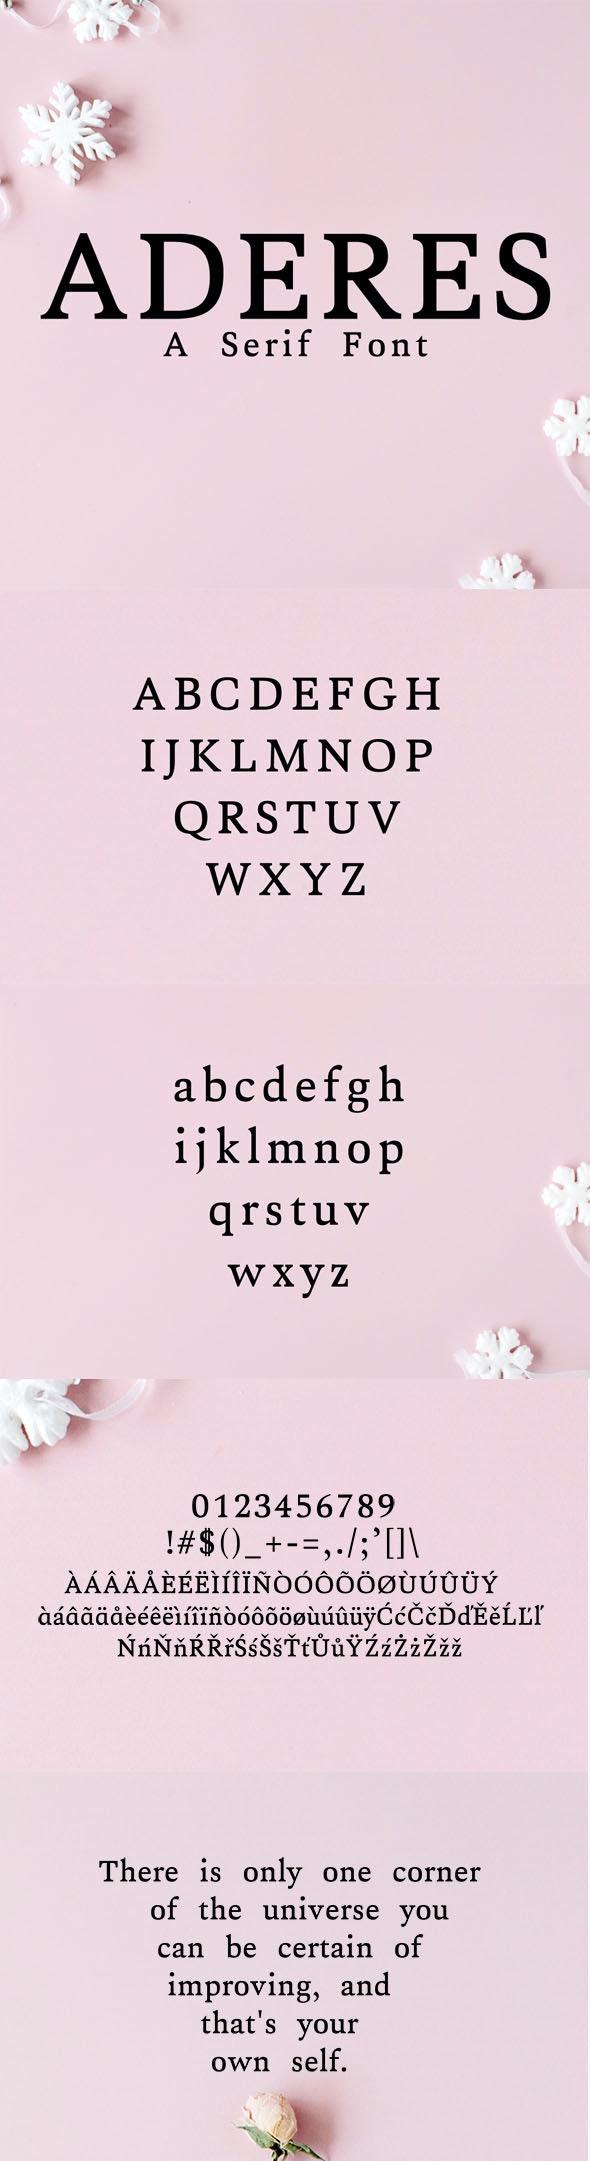 Aderes Serif Font Family - Serif Fonts